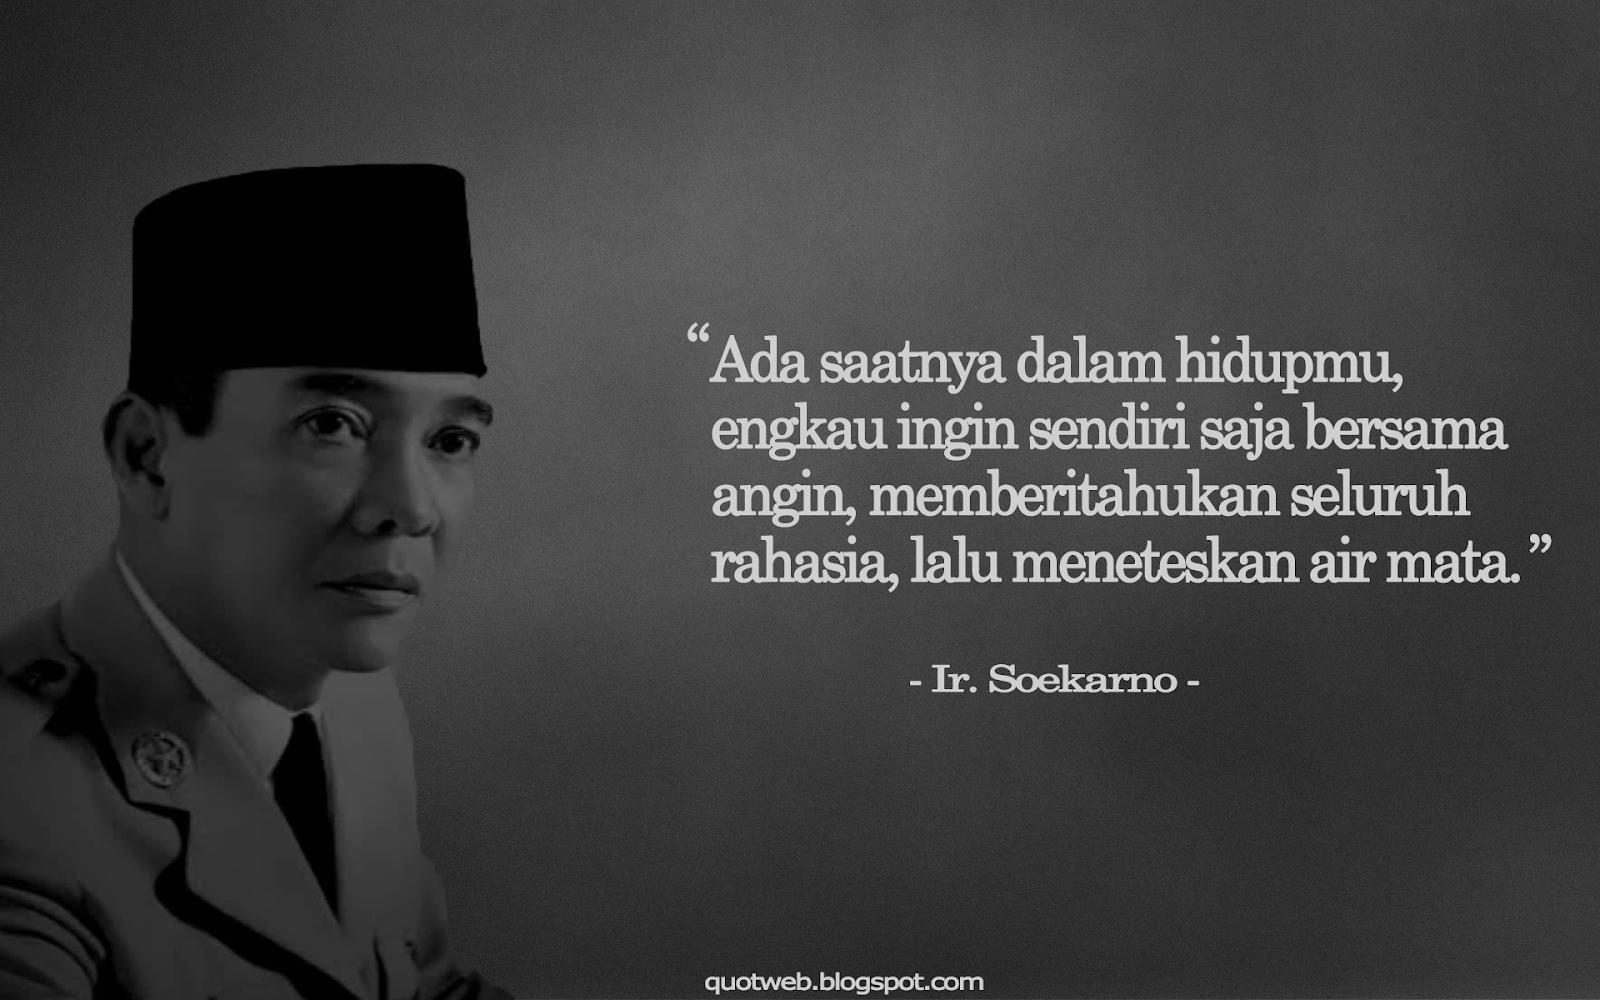 Kumpulan Kata Bijak Presiden Sukarno Quotweb